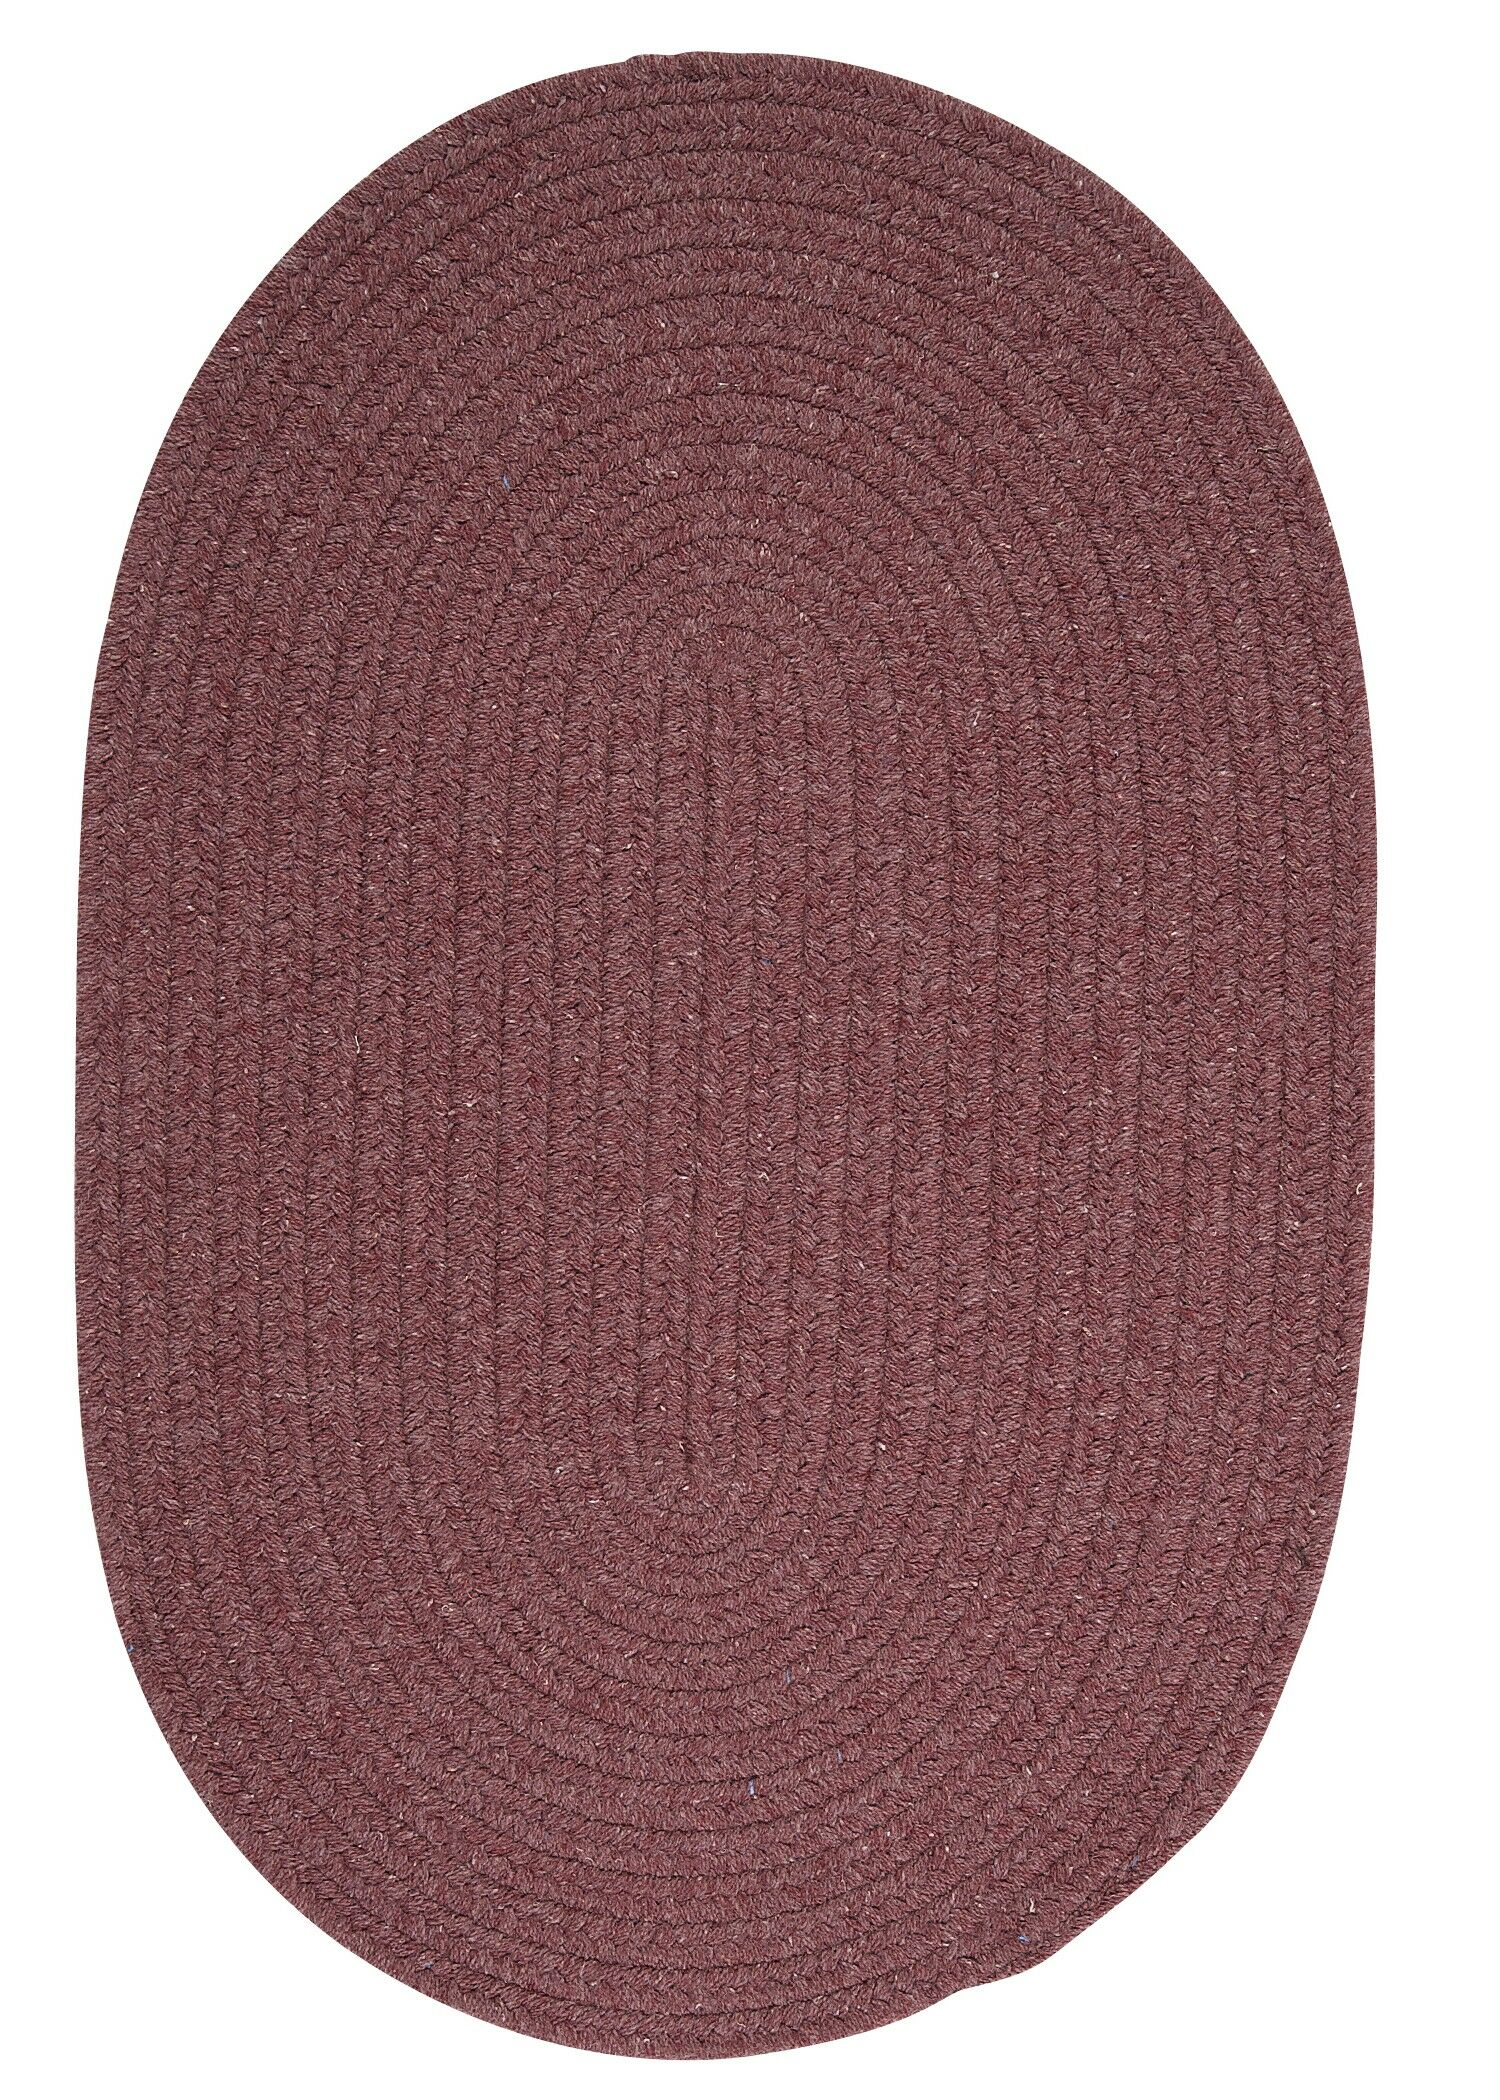 Navarrette Purple Area Rug Rug Size: Round 6'